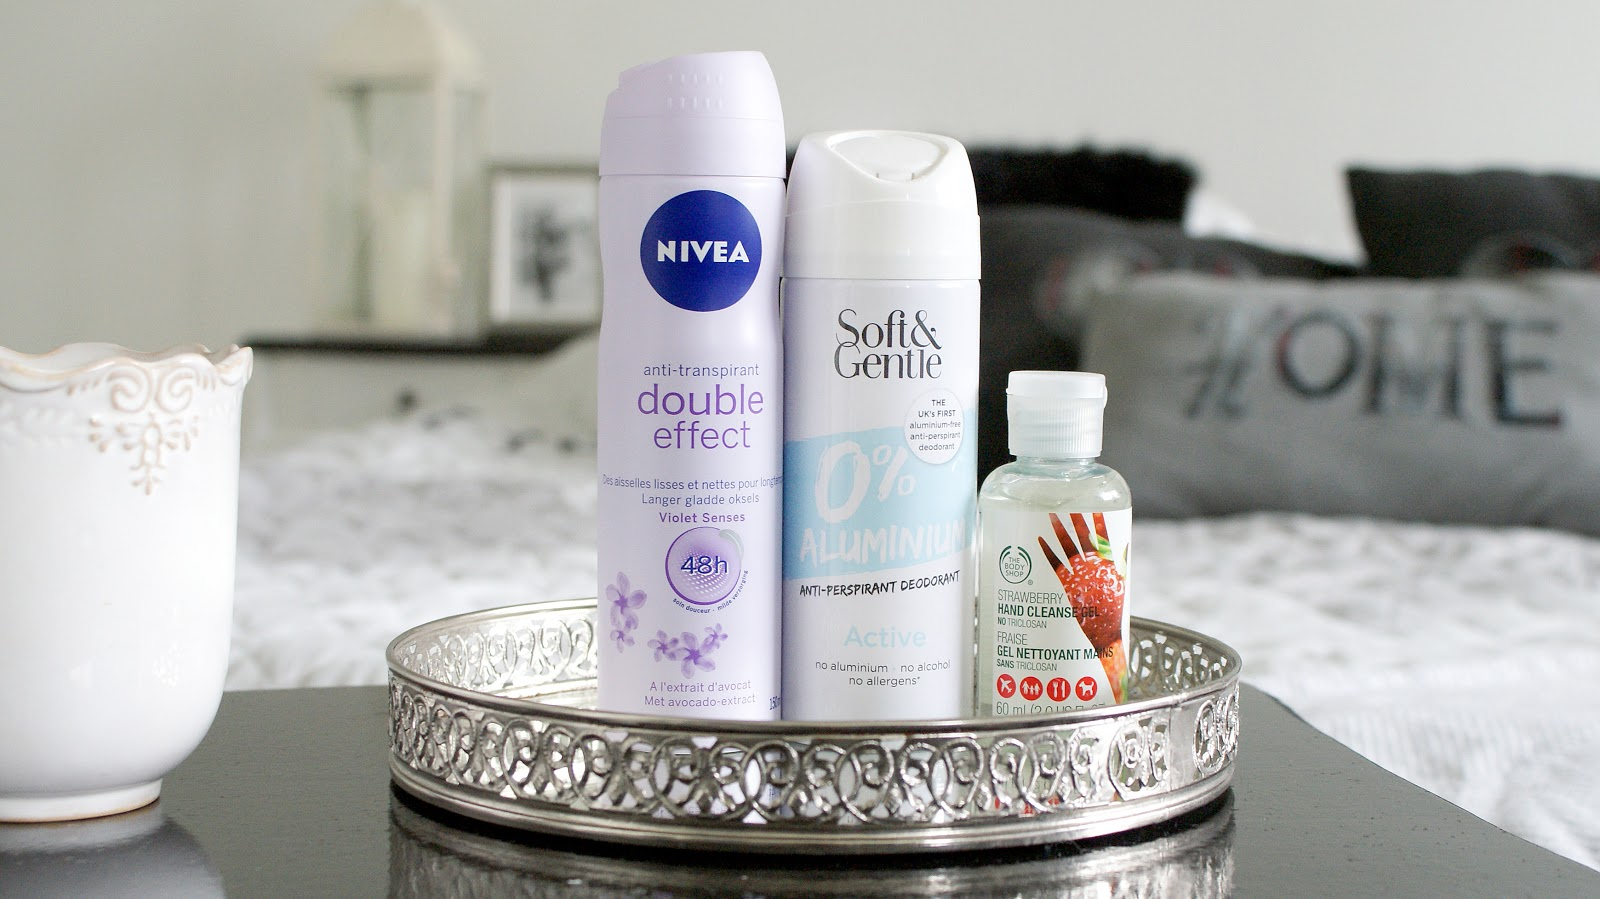 antyperspirant w spray, antyperspirant nivea, nivea, soft&gentle, antyperspirant bez soli aluminium, the body shop, żel antybakteryjny do rąk,